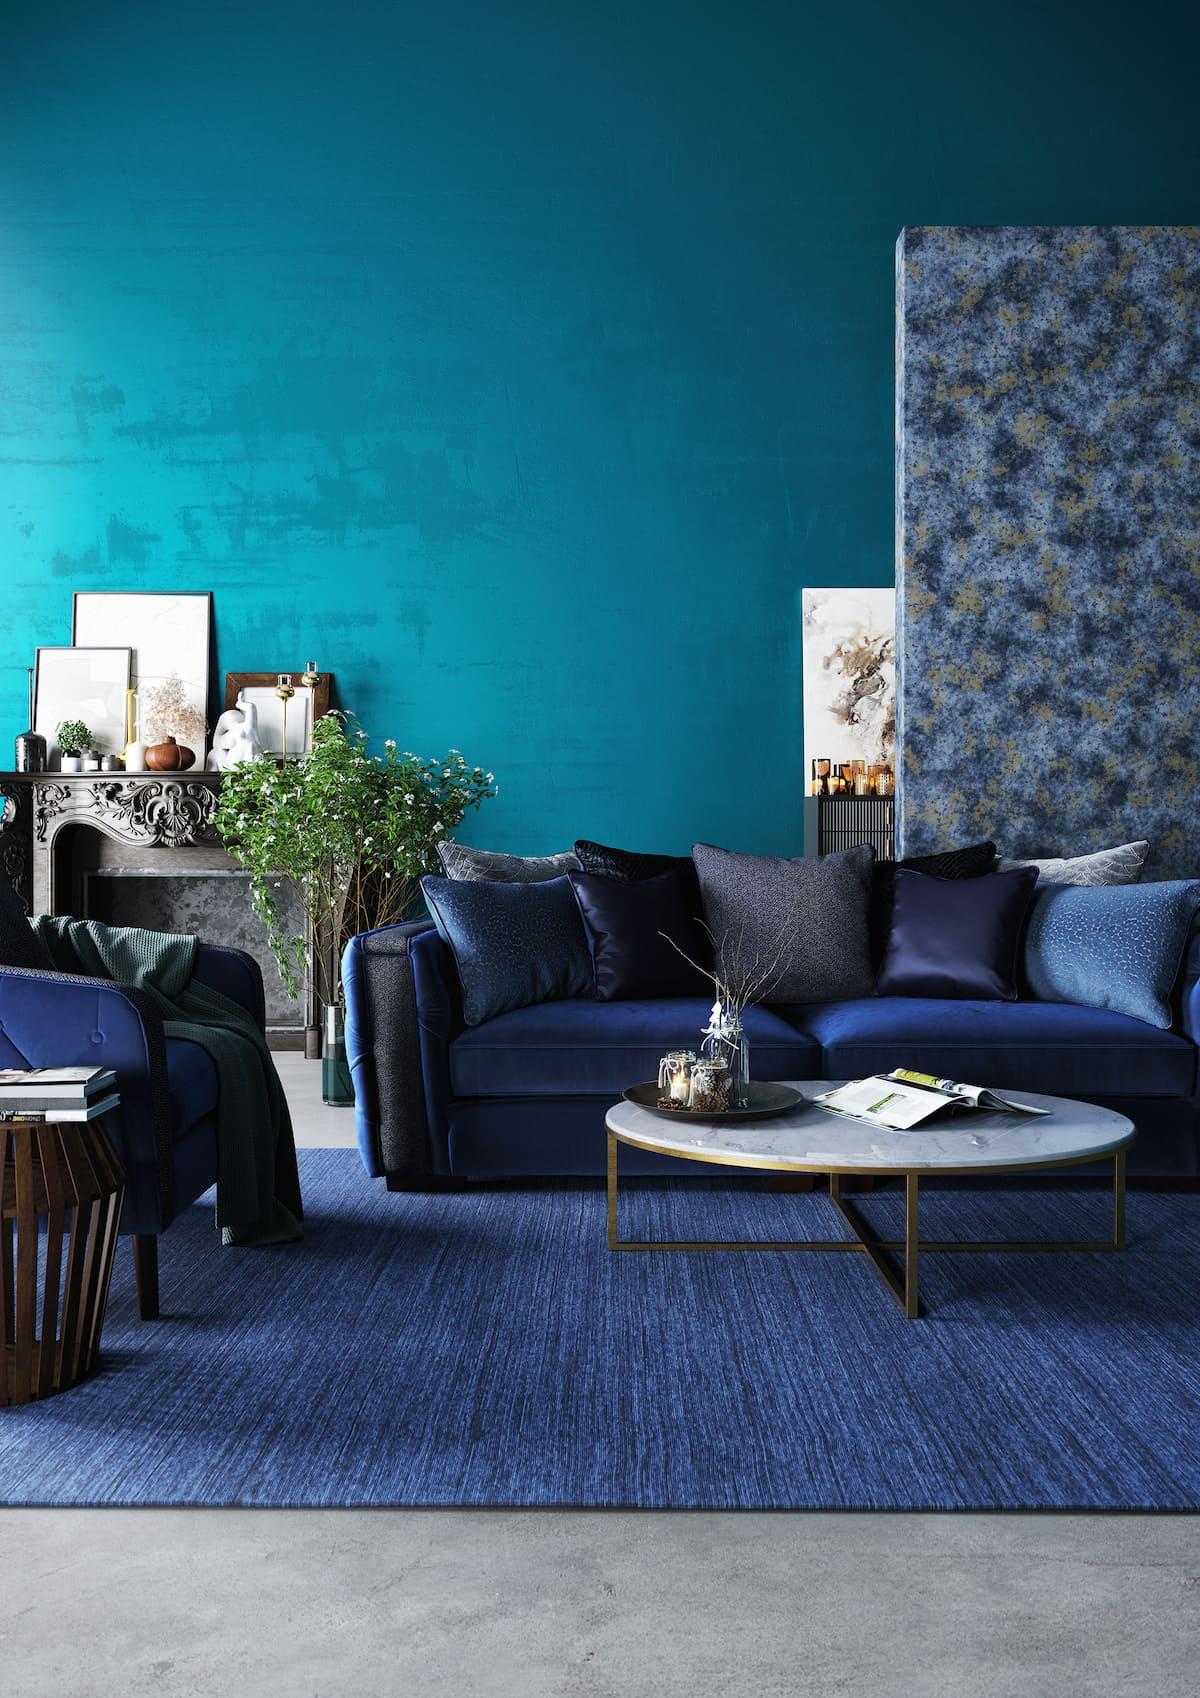 дизайн интерьера модной квартиры фото 19